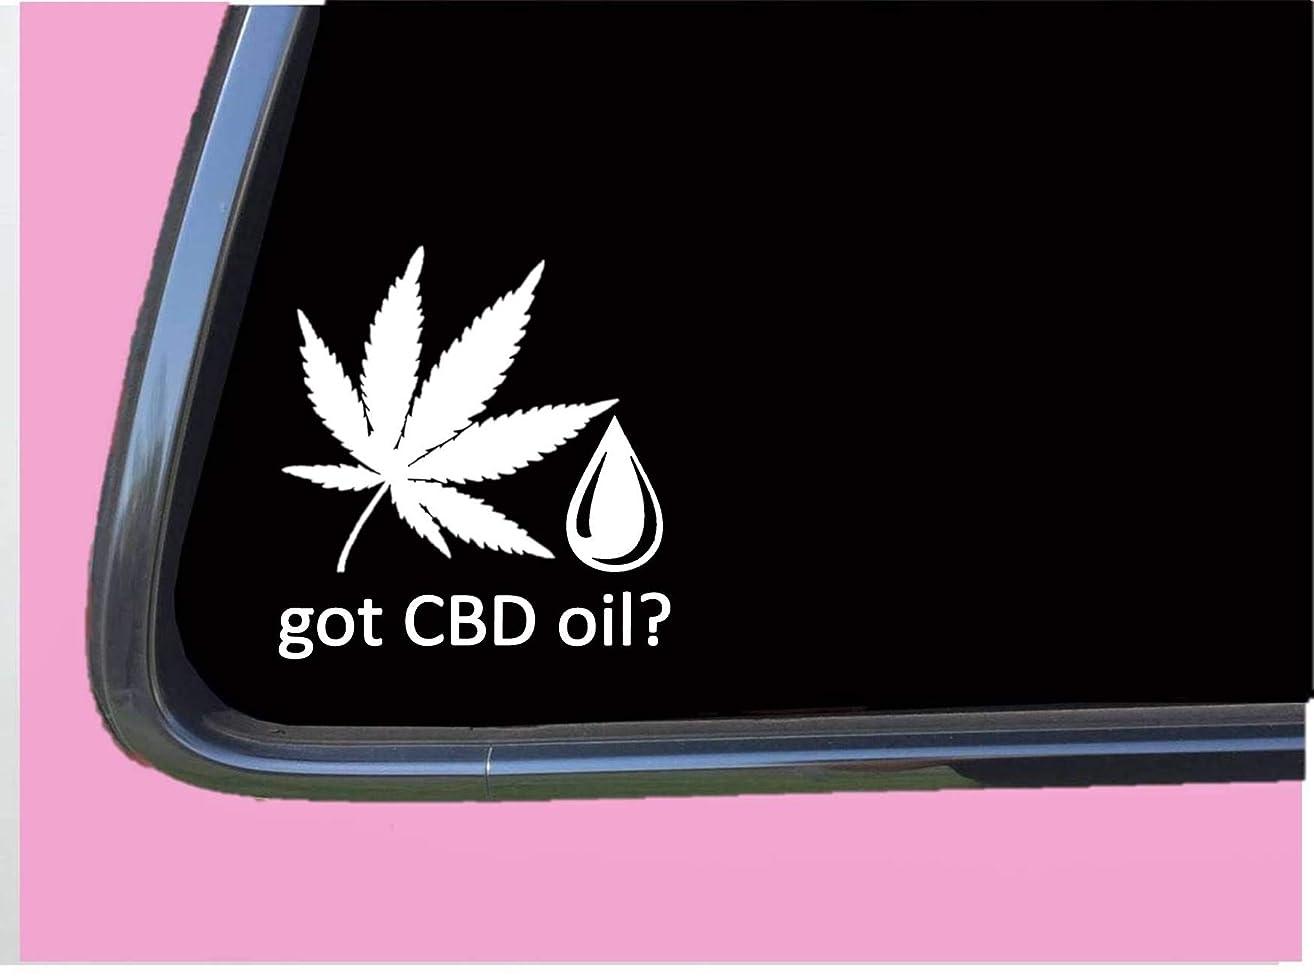 got CBD oil Sticker TP 636 6